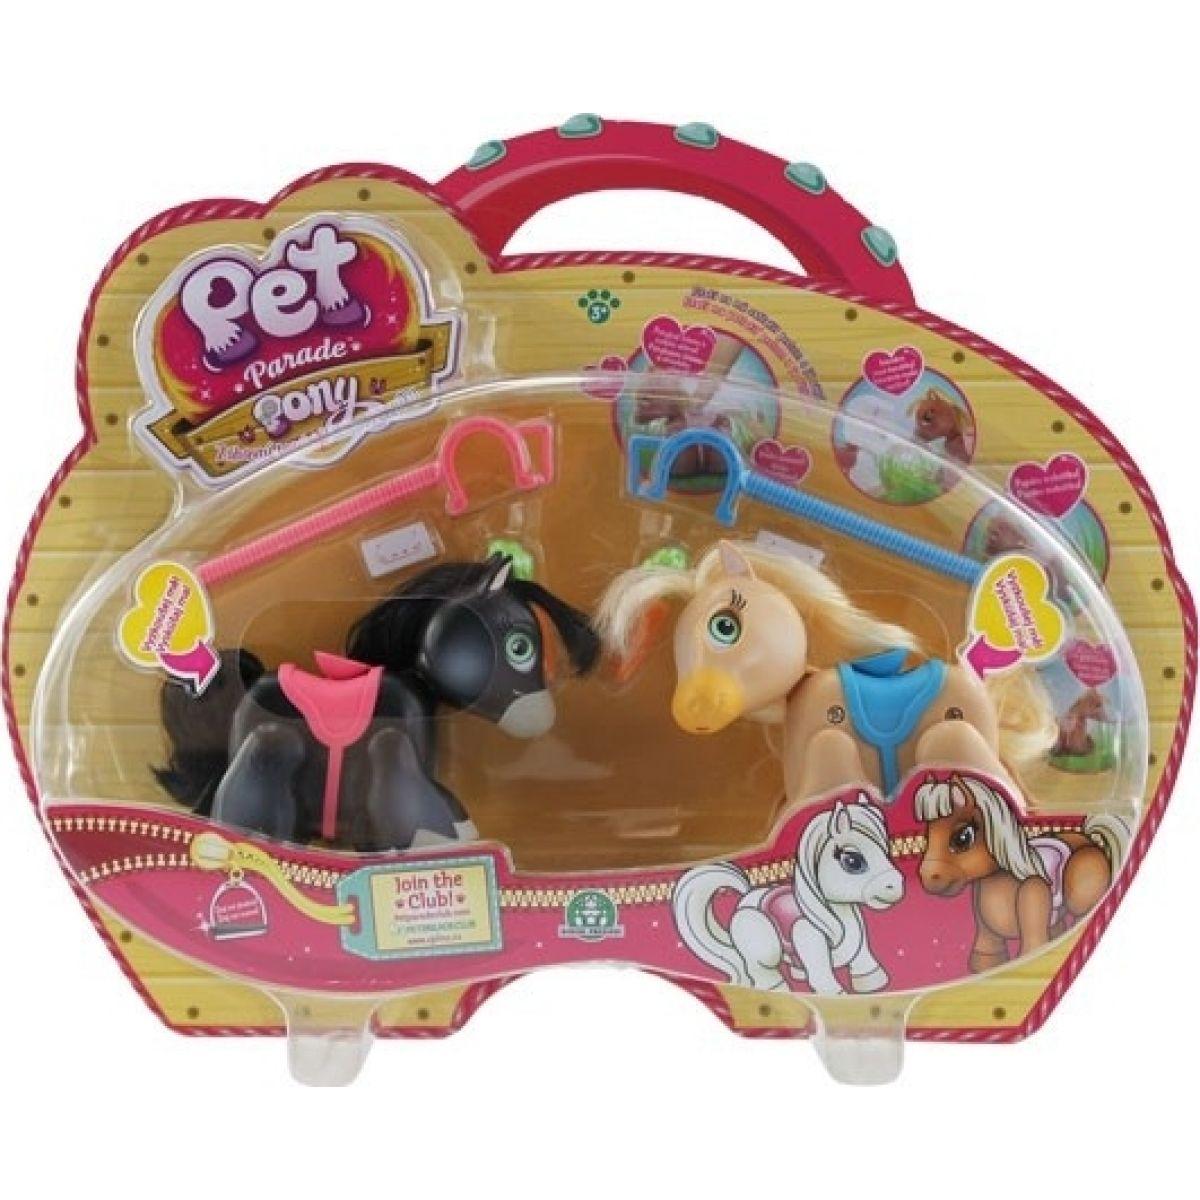 EP Line Pet Parade Poníky 2 ks strakatý poník